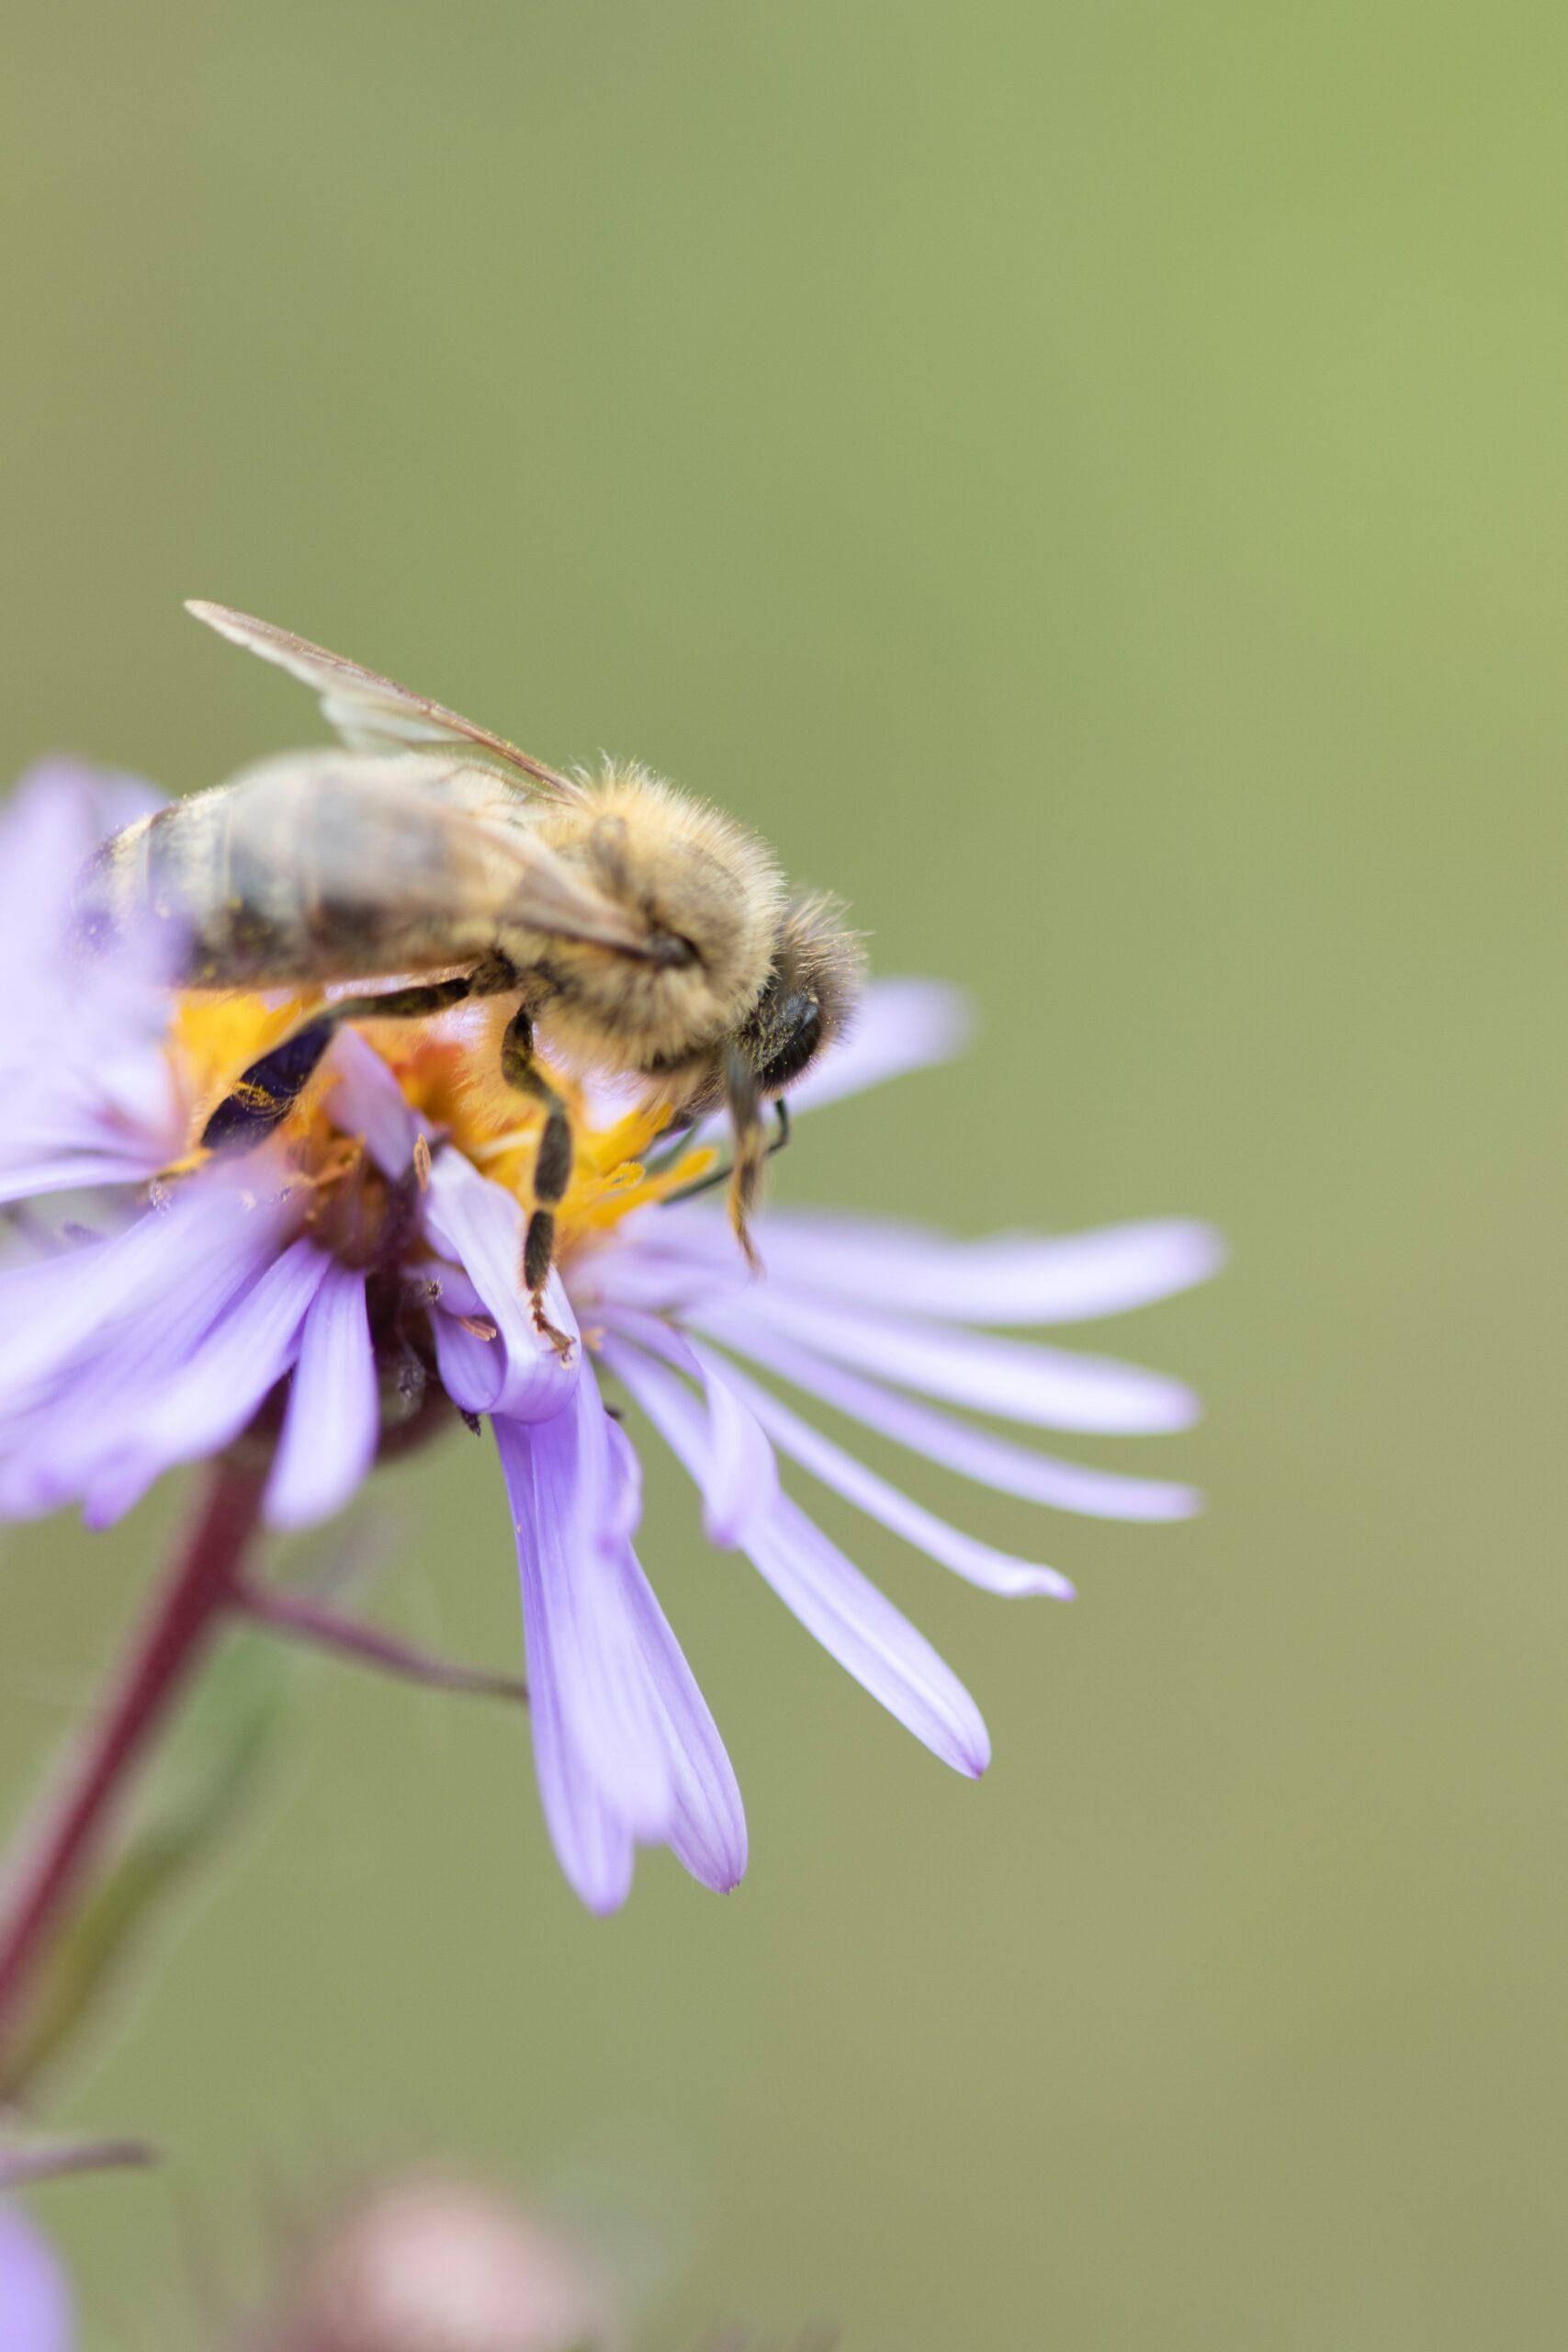 cameron-ballantyne-smith-Honey Bee on Purple Coneflower collecting nectar up close shot-unsplash